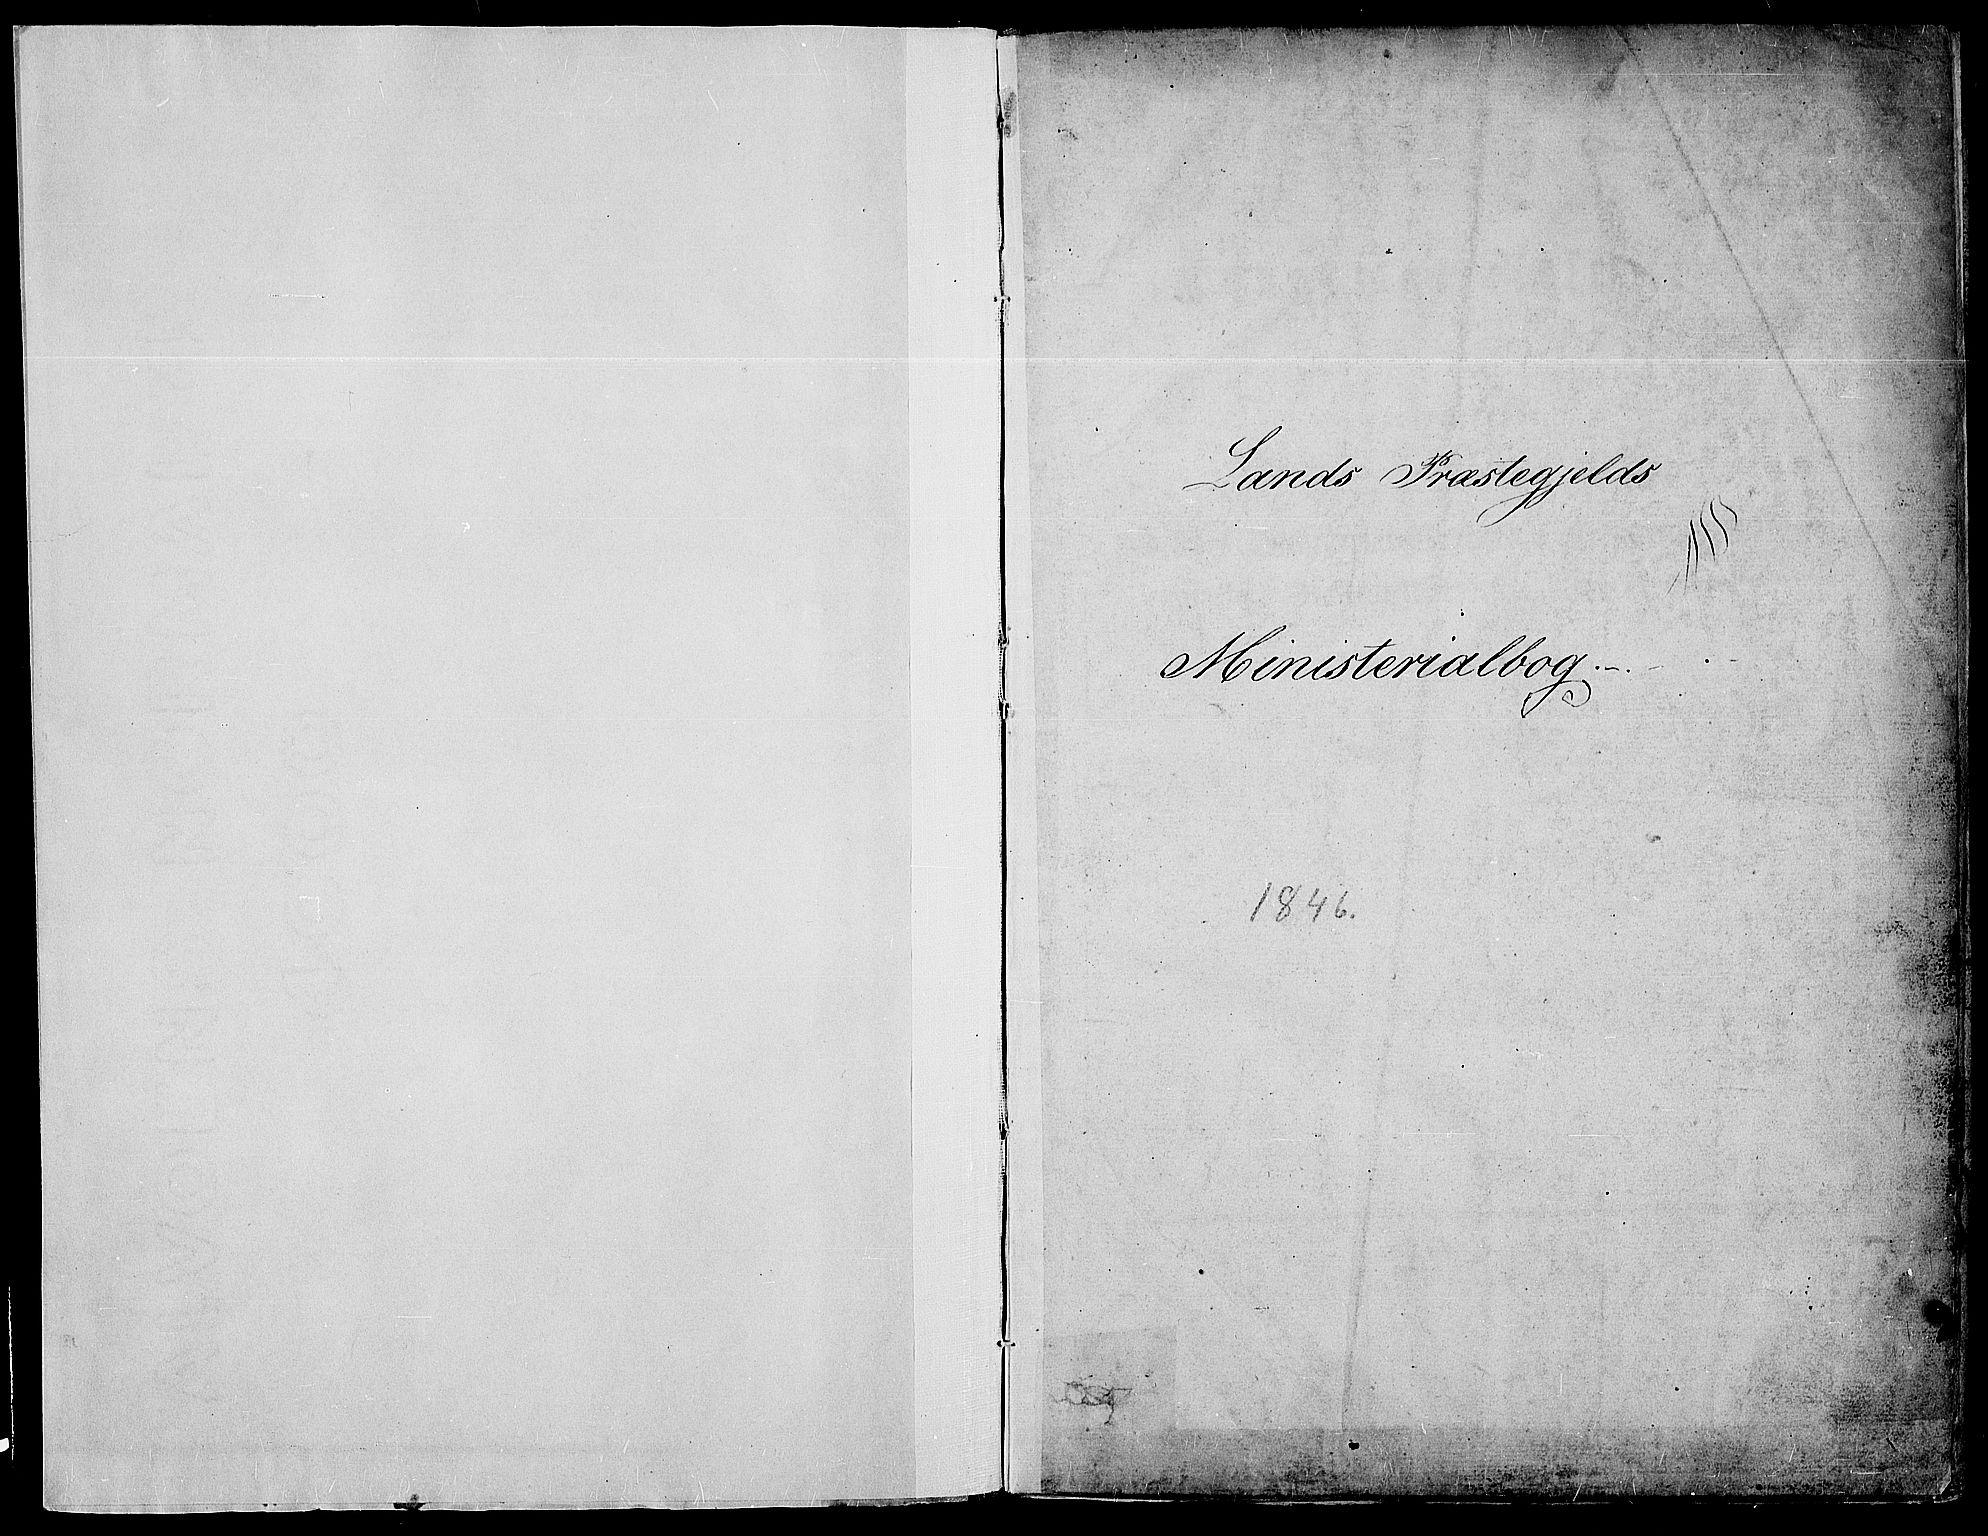 SAH, Land prestekontor, Ministerialbok nr. 8, 1830-1846